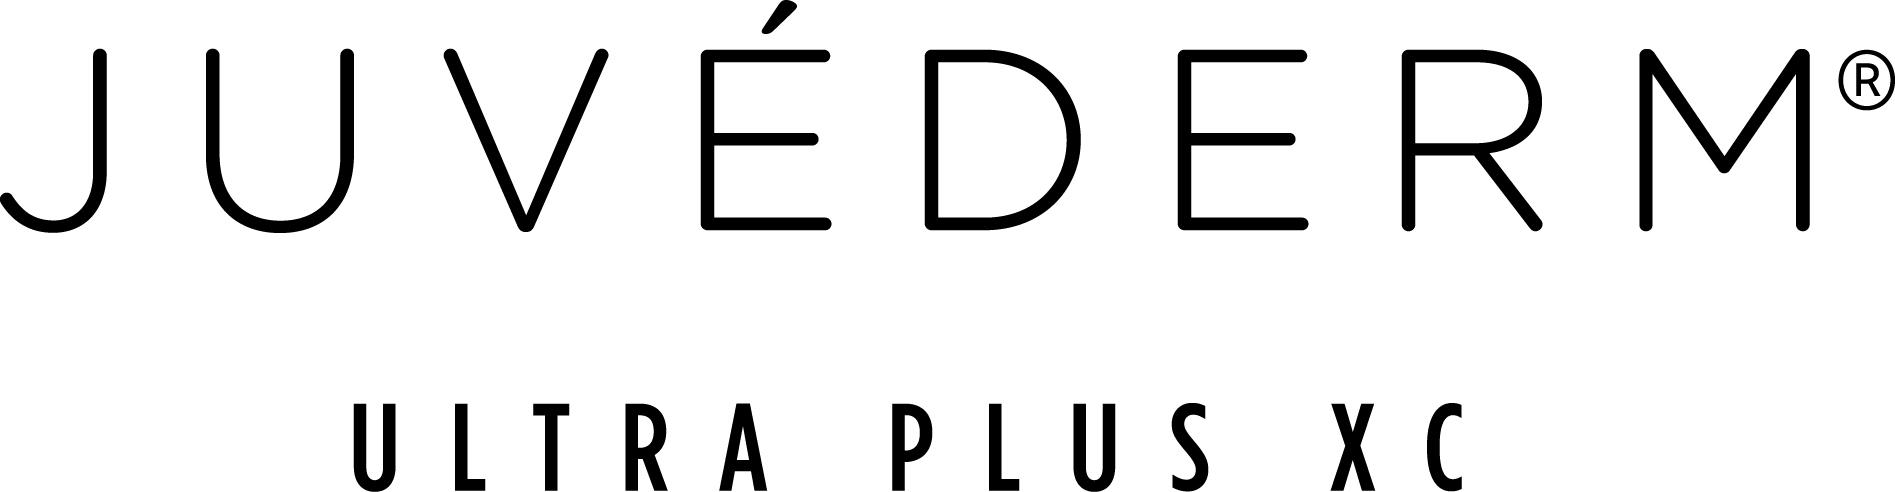 New Juvederm UltraPlus XC logo